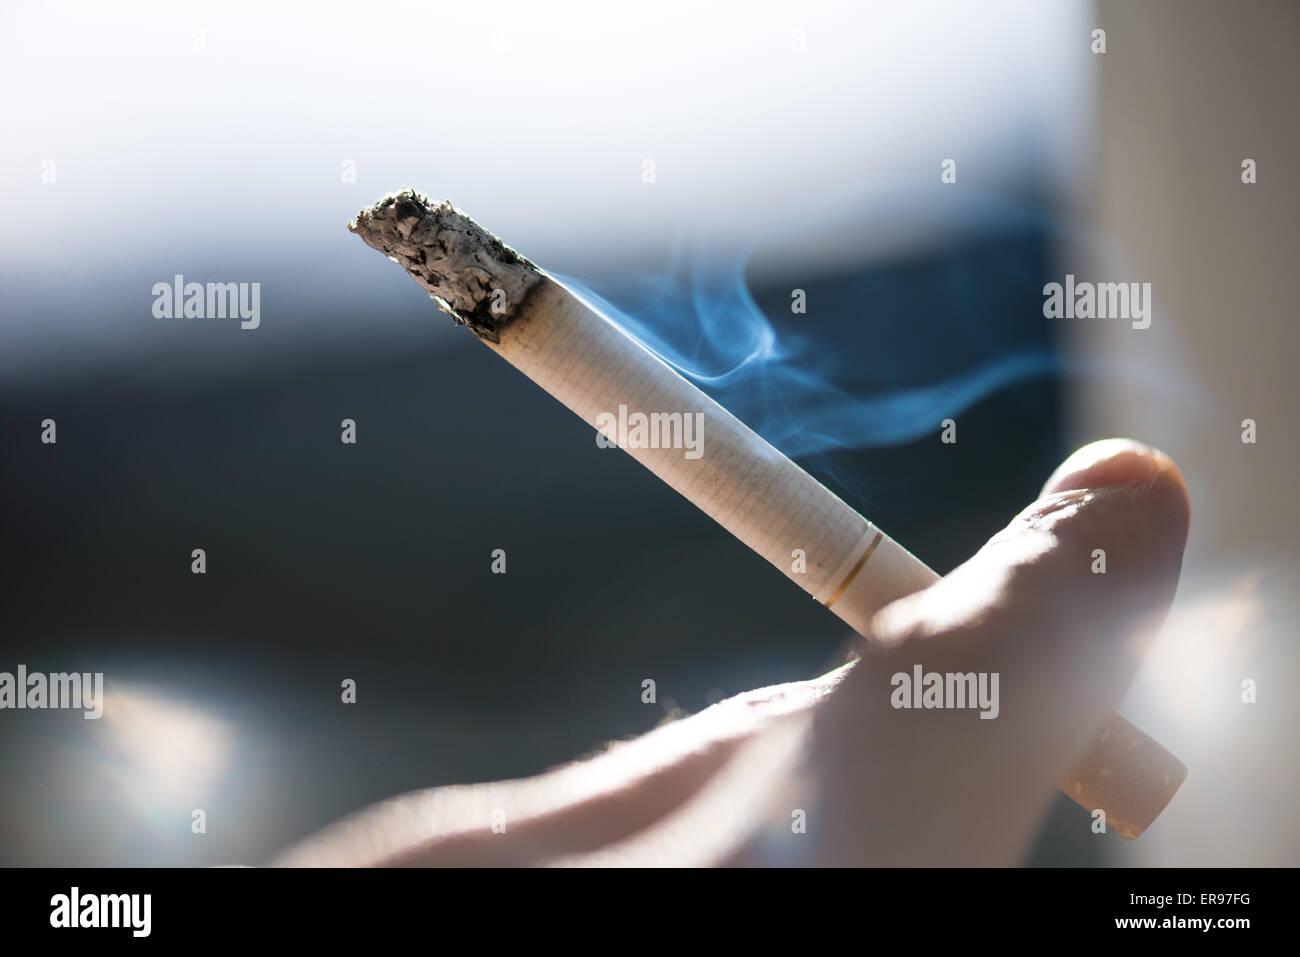 cigarette smoking - Stock Image